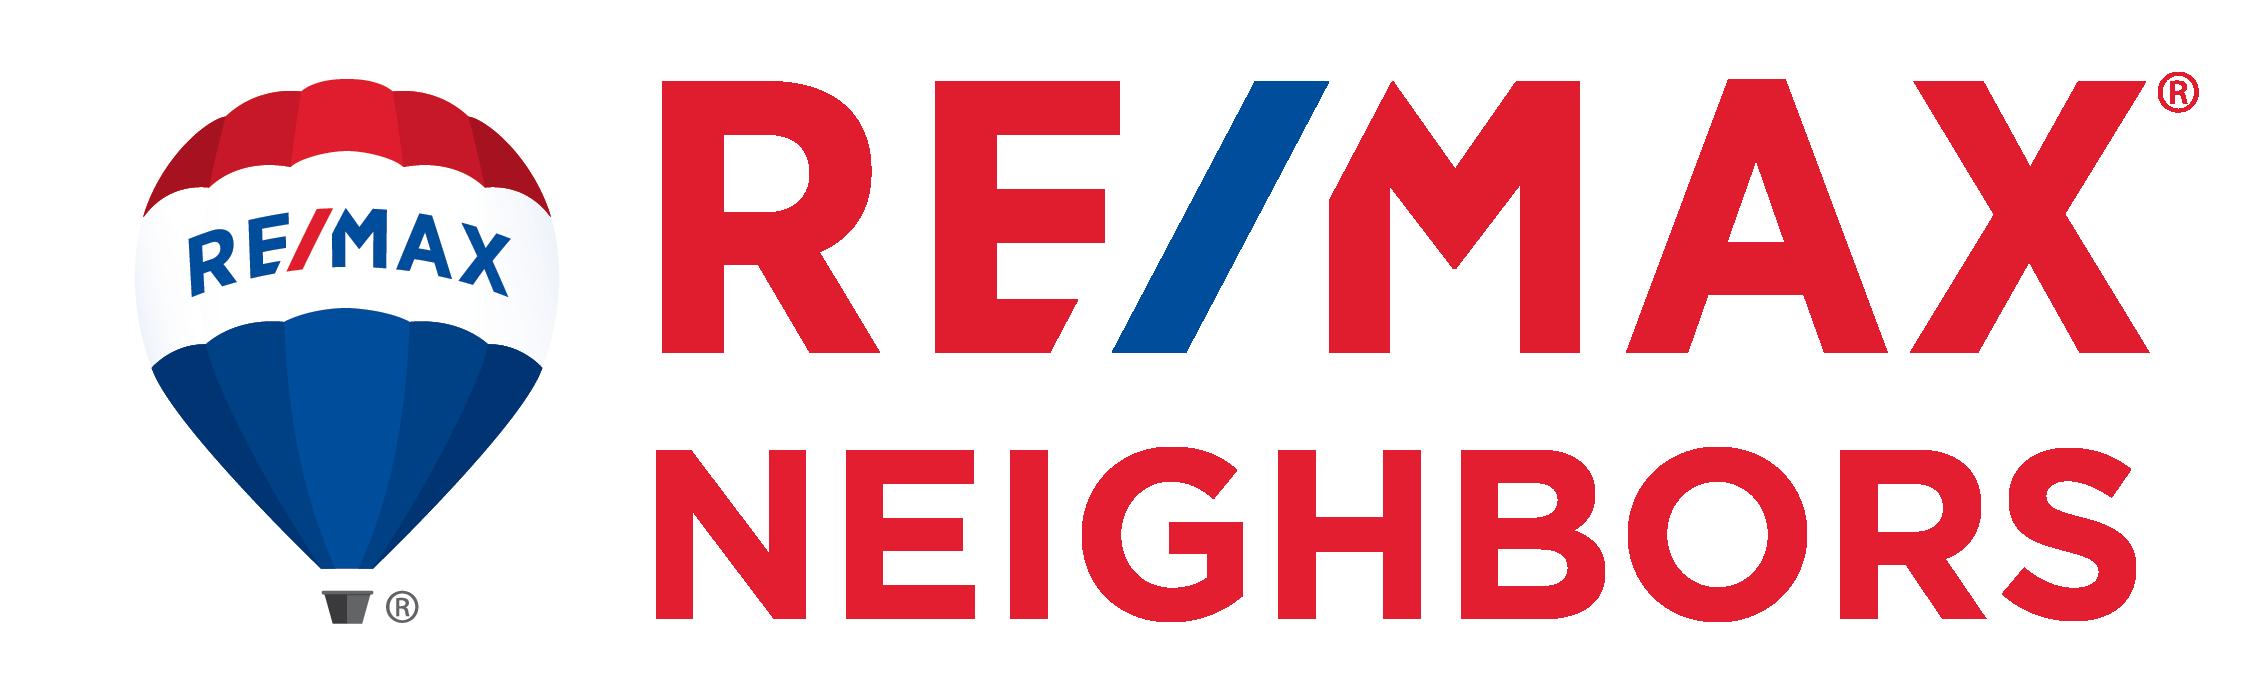 RE/MAX Neighbors